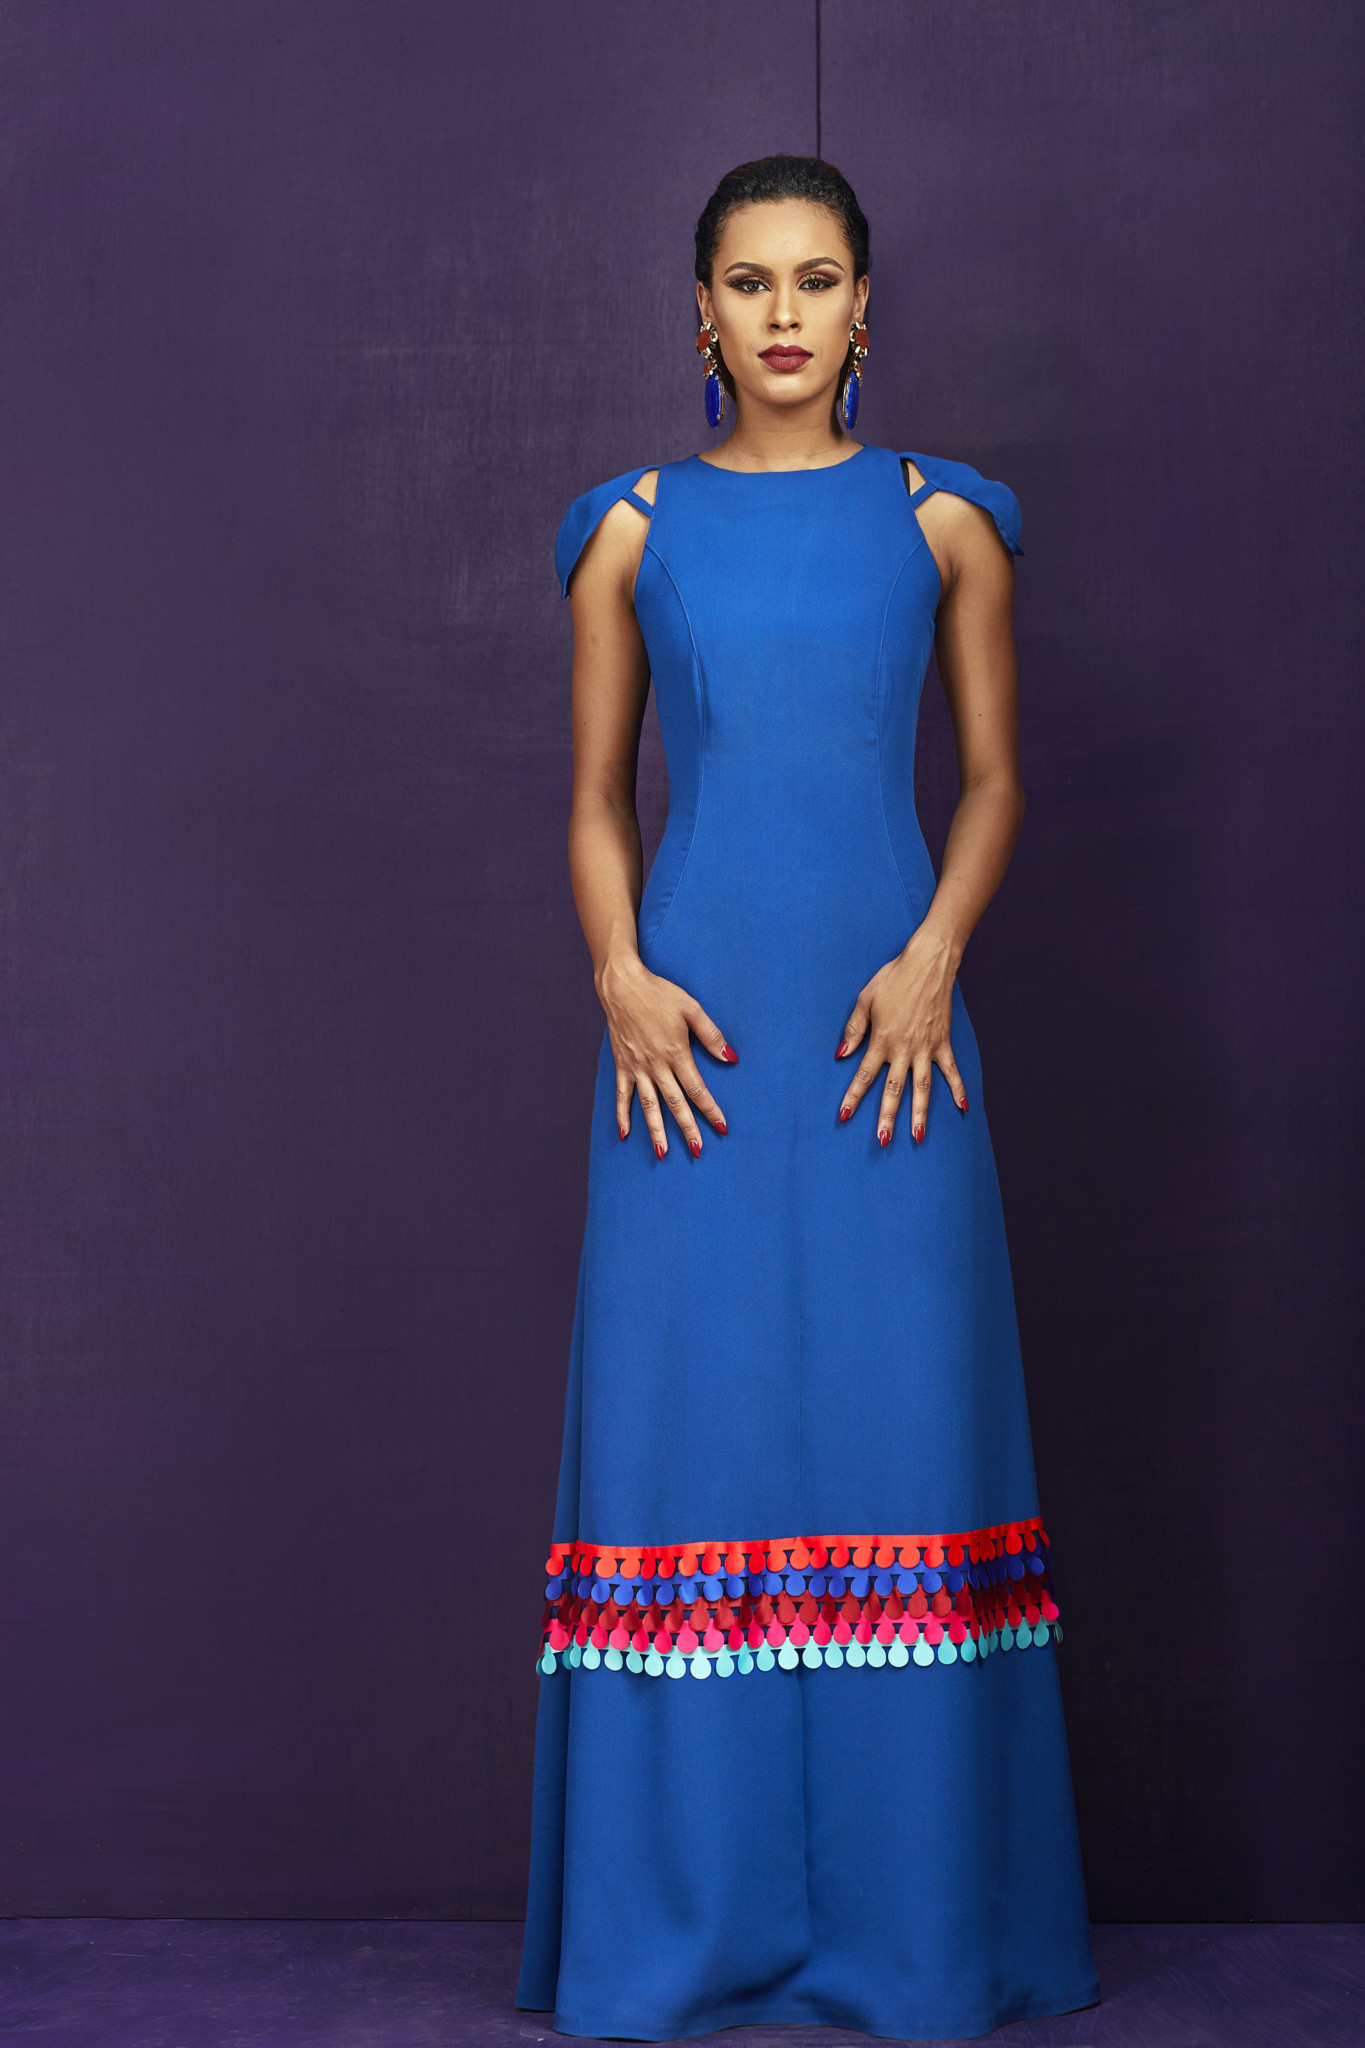 Nigerian Womenswear Brand Kareema Mak